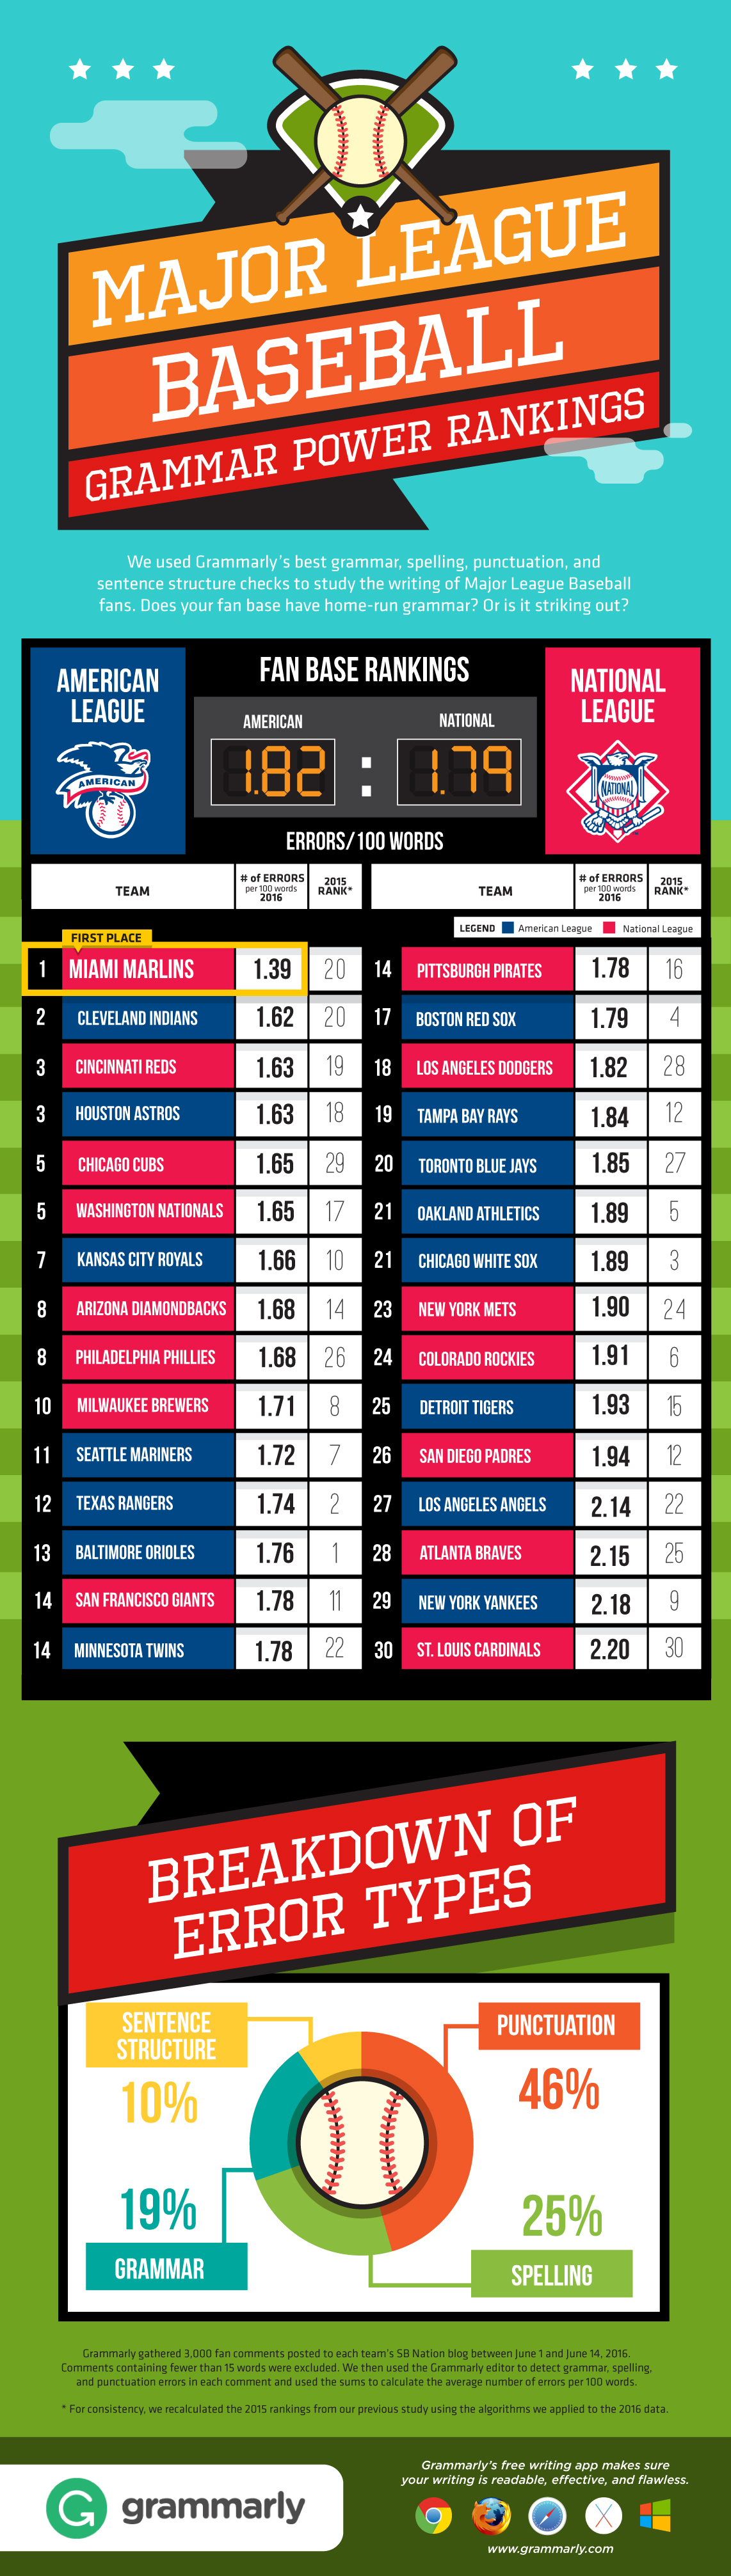 MLB 2016 Grammar Power Rankings Infographic